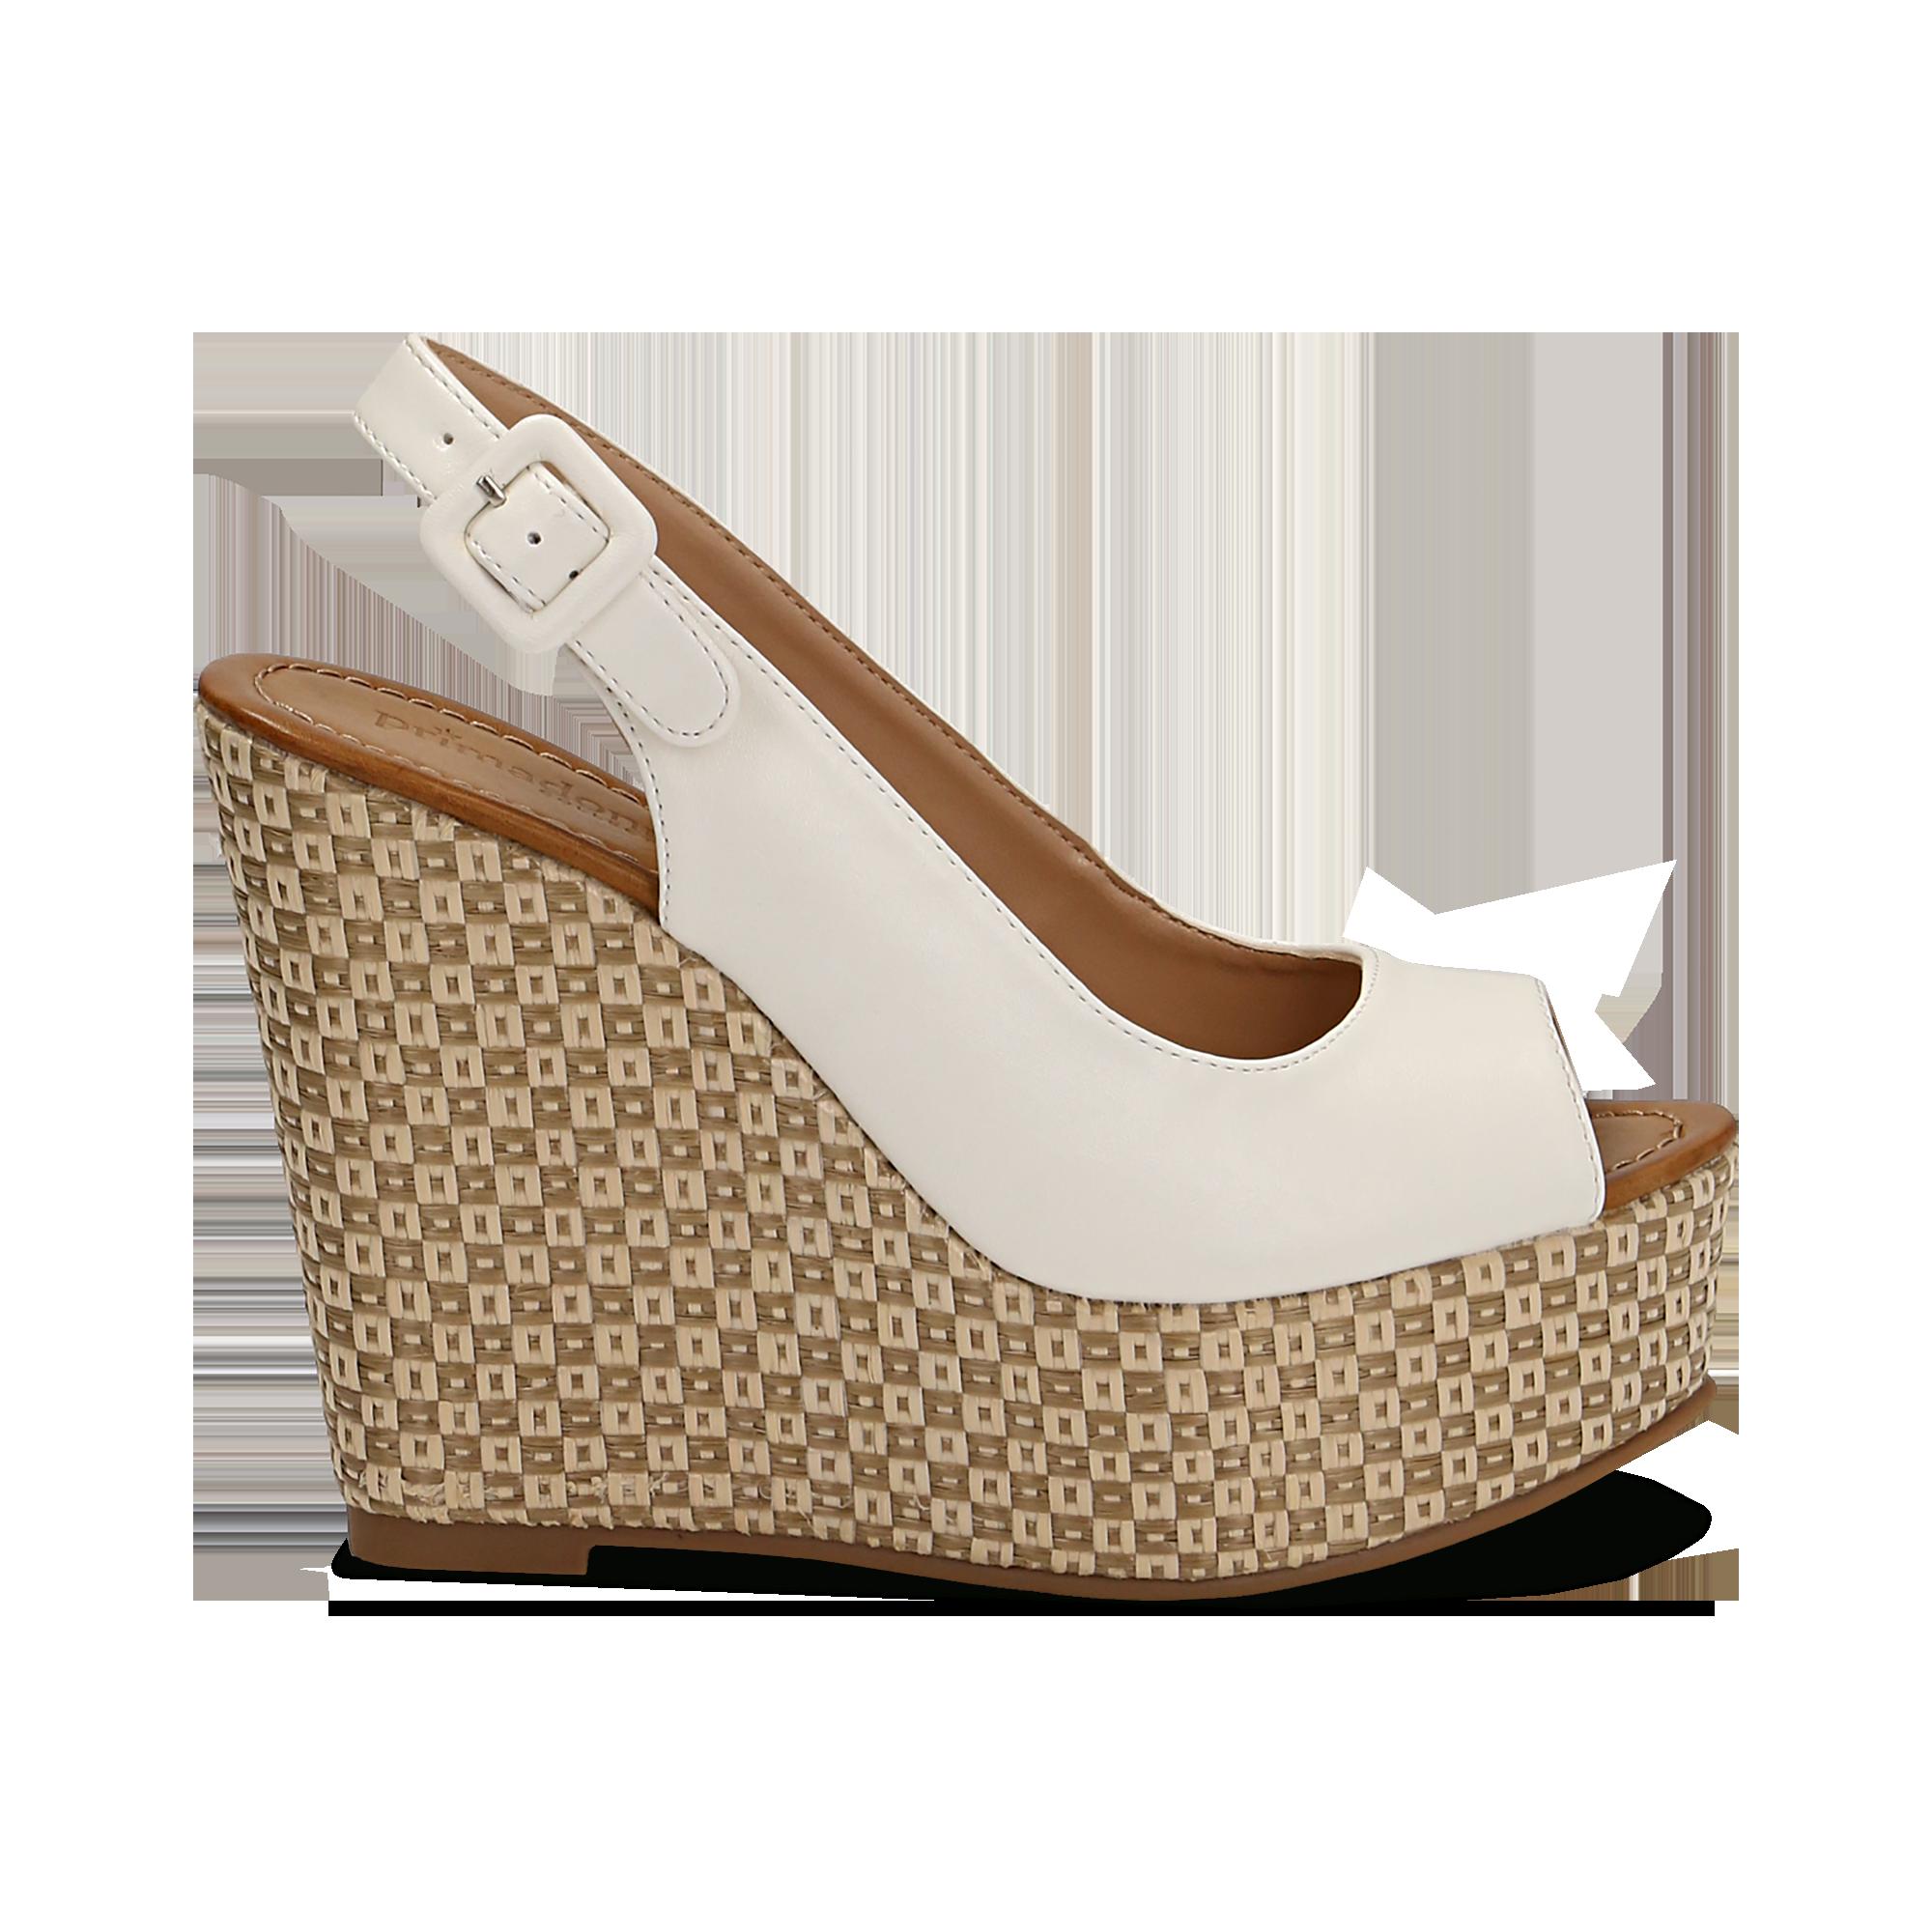 f3029d40a84d13 Sandali platform bianchi, zeppa intrecciata 13 cm donna | Primadonna  Collection